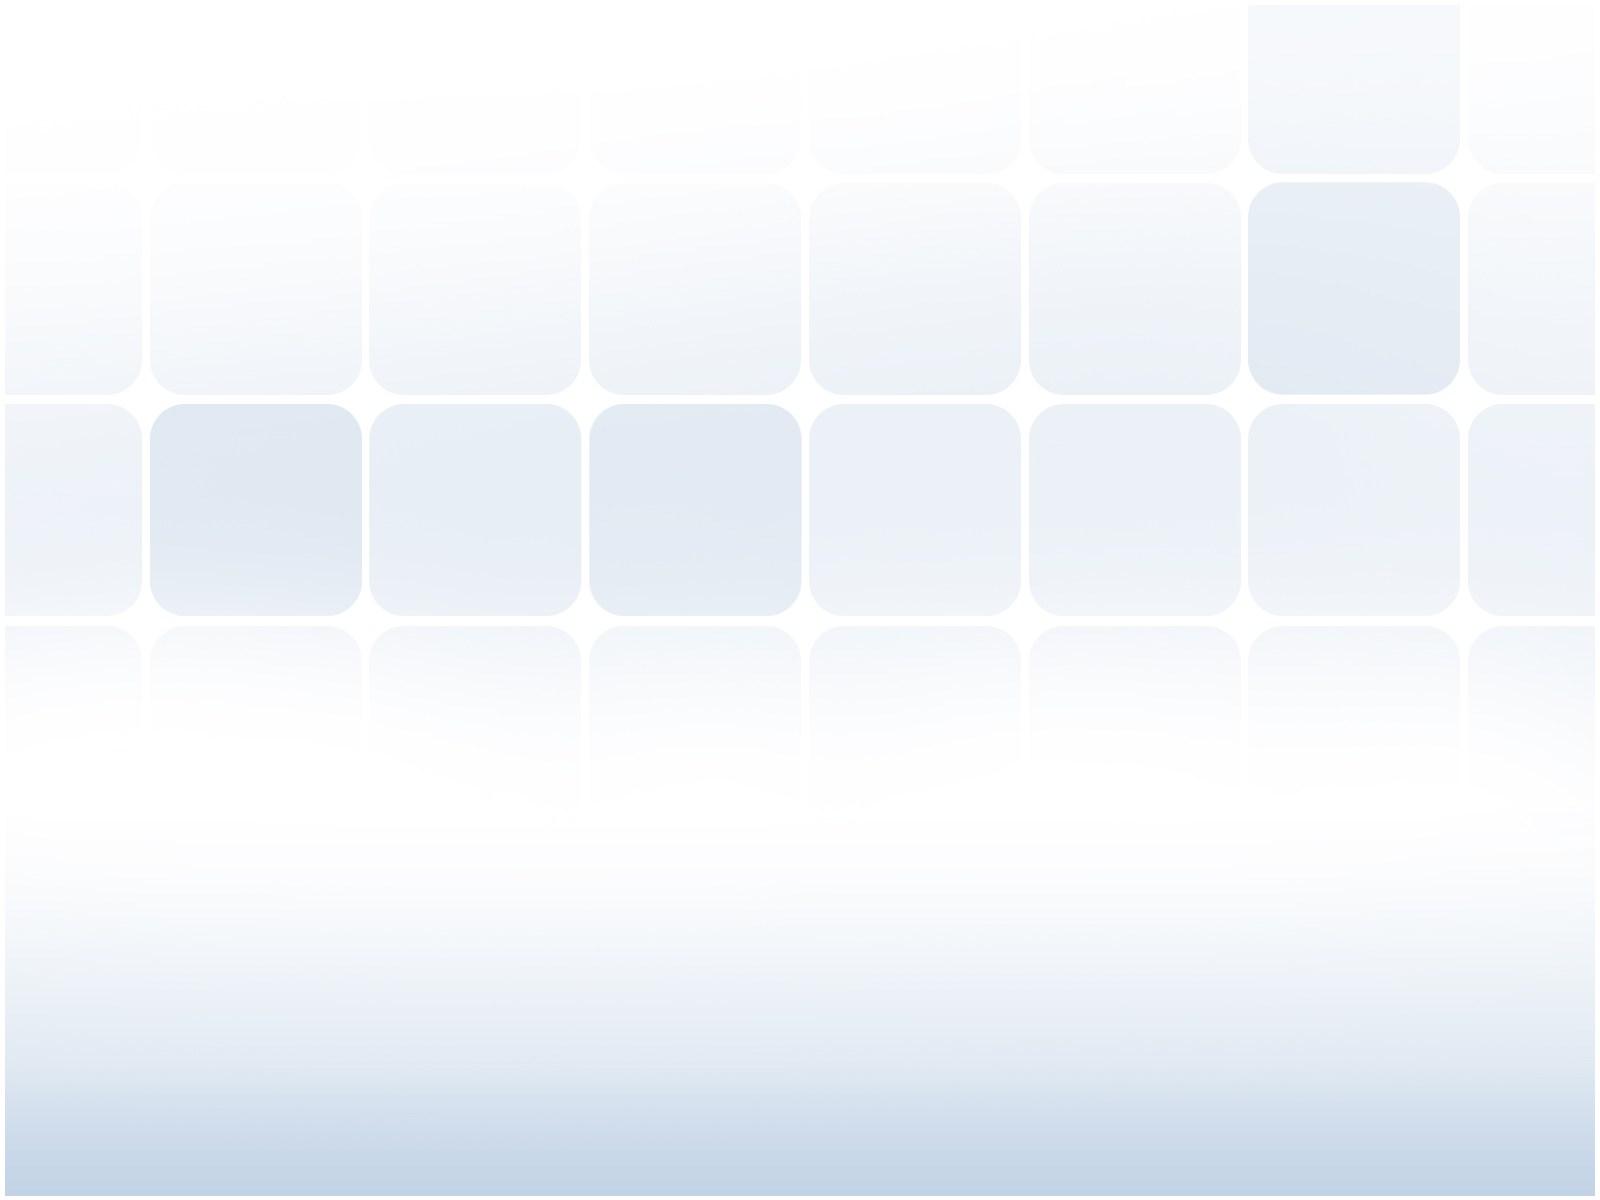 White Grid Wallpaper - WallpaperSafari